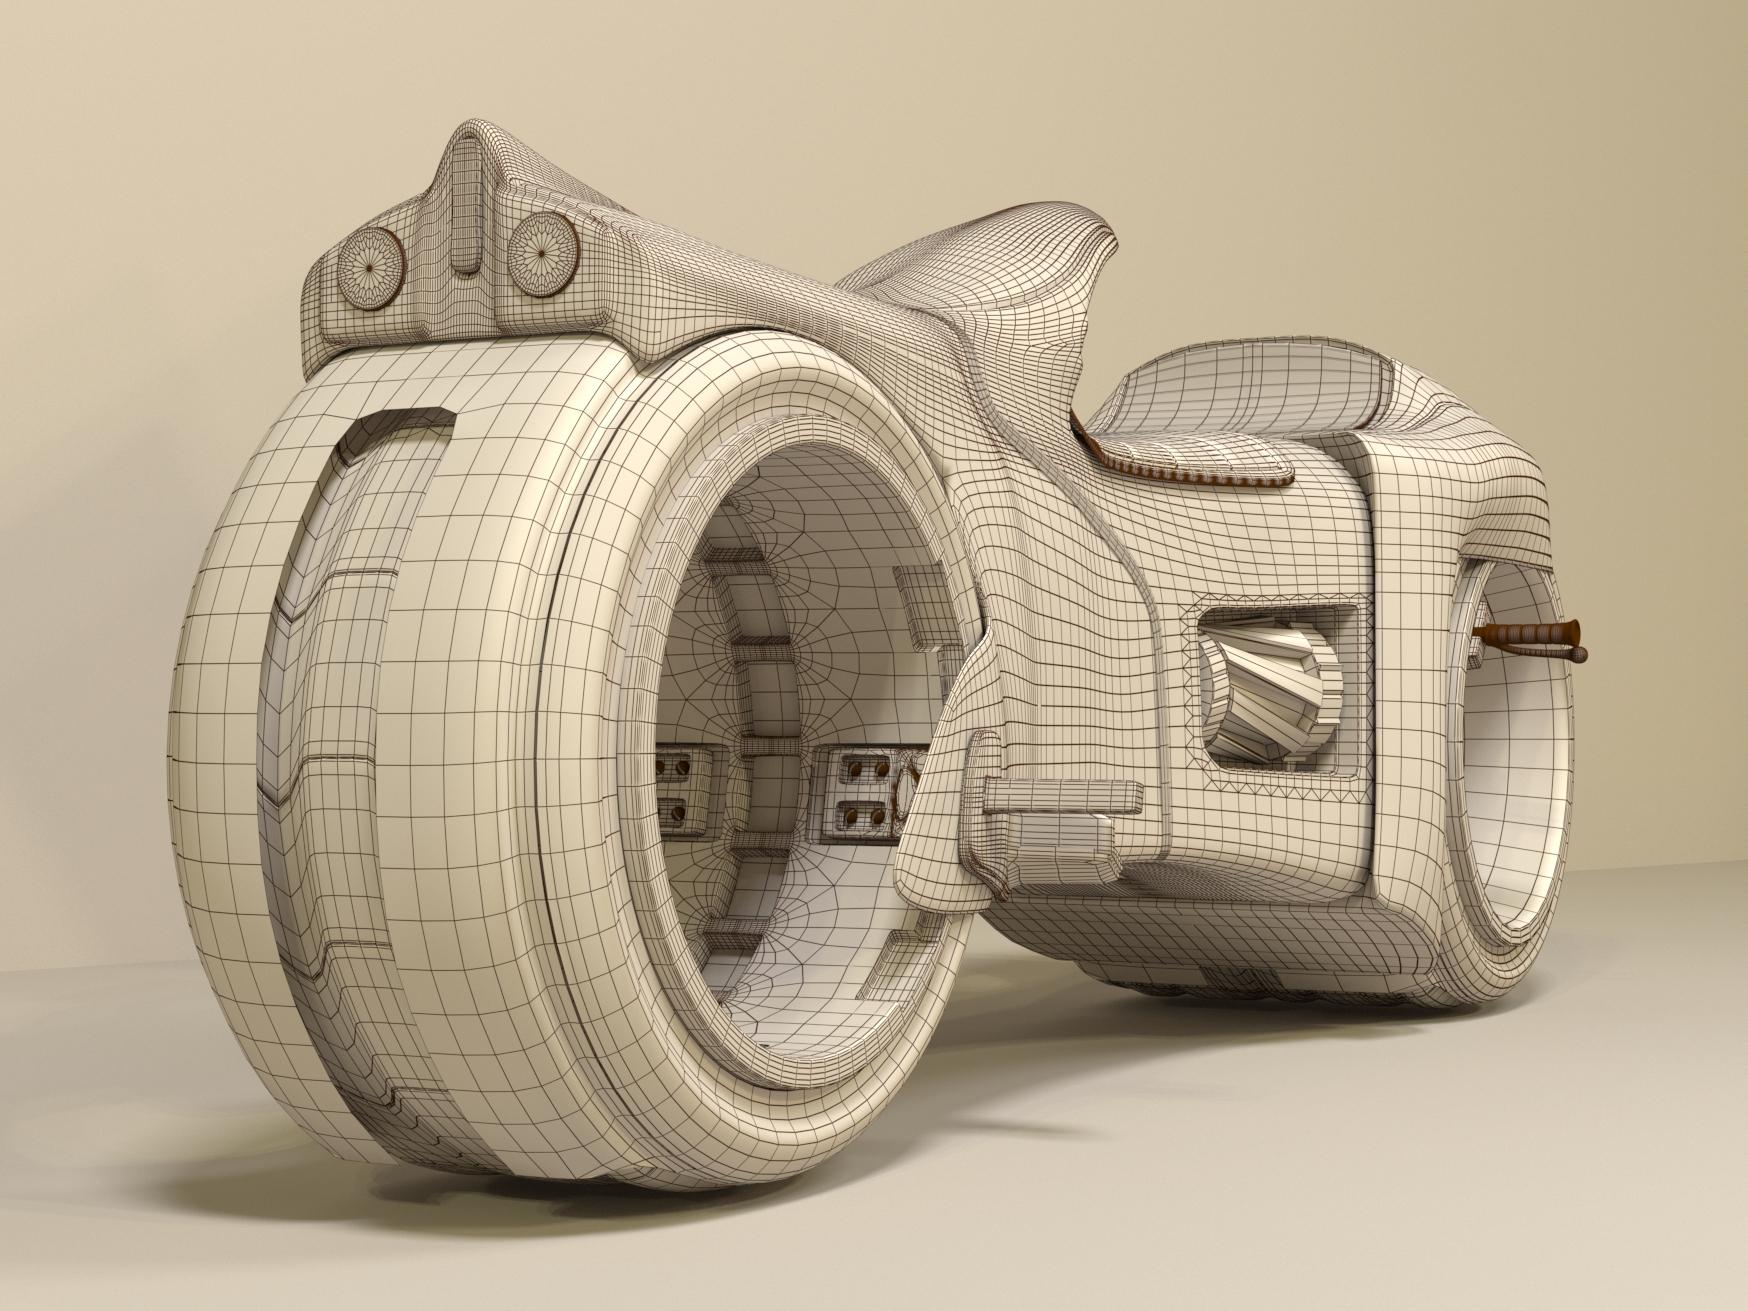 Tron motorcycle in 3d max corona render image